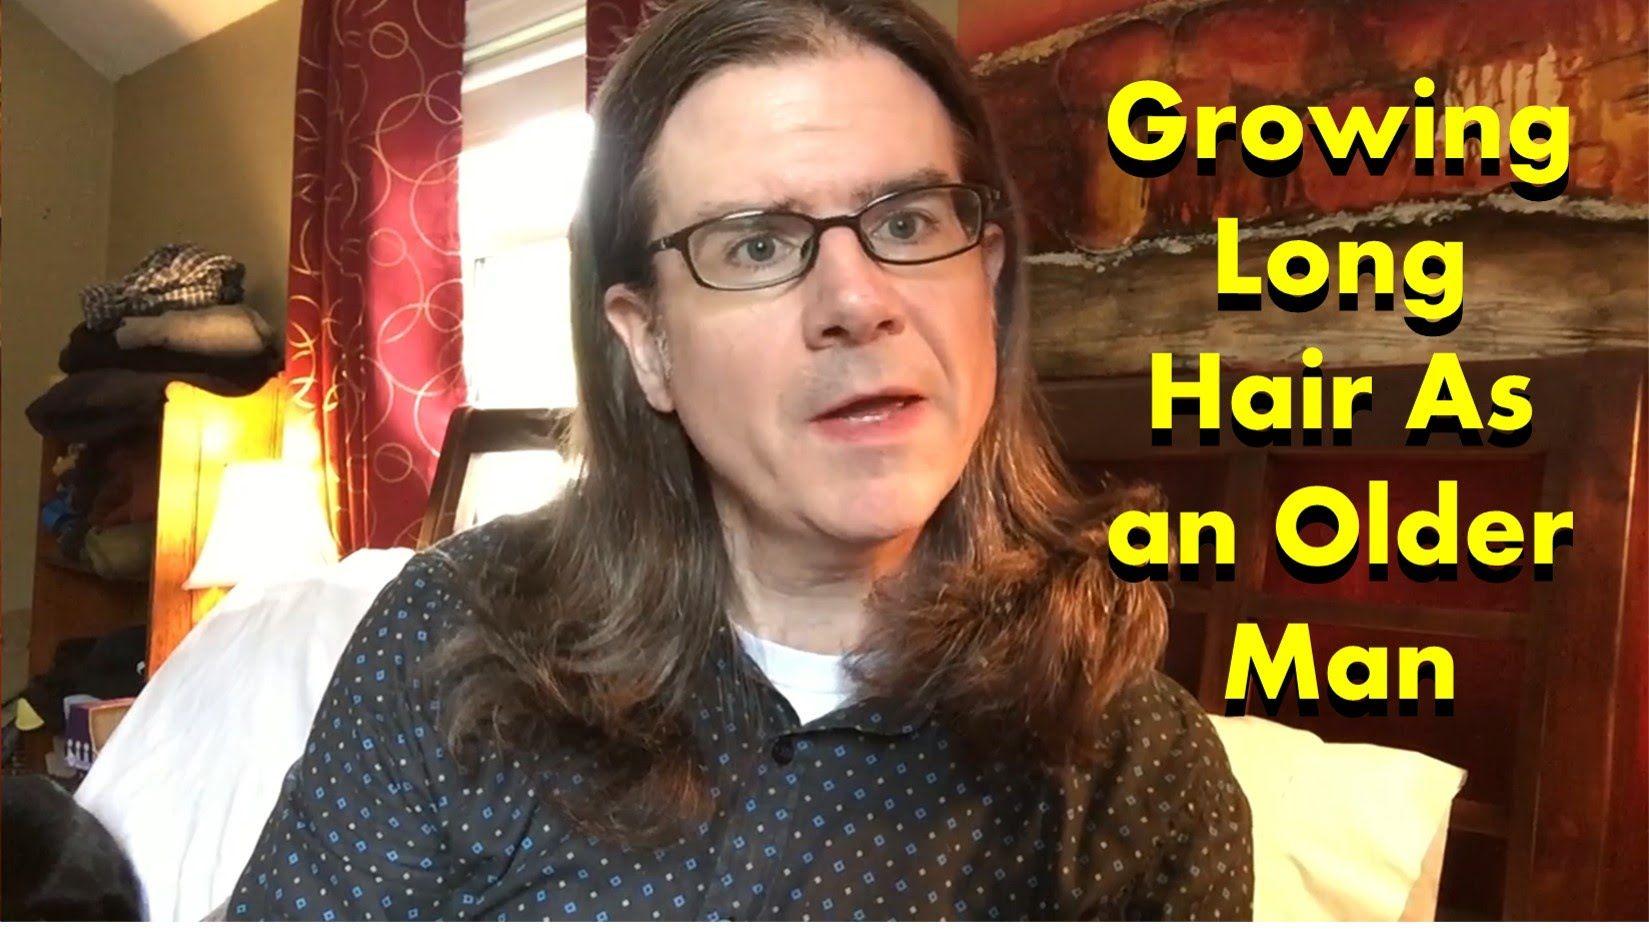 Growing long hair as an older man grow long hair long